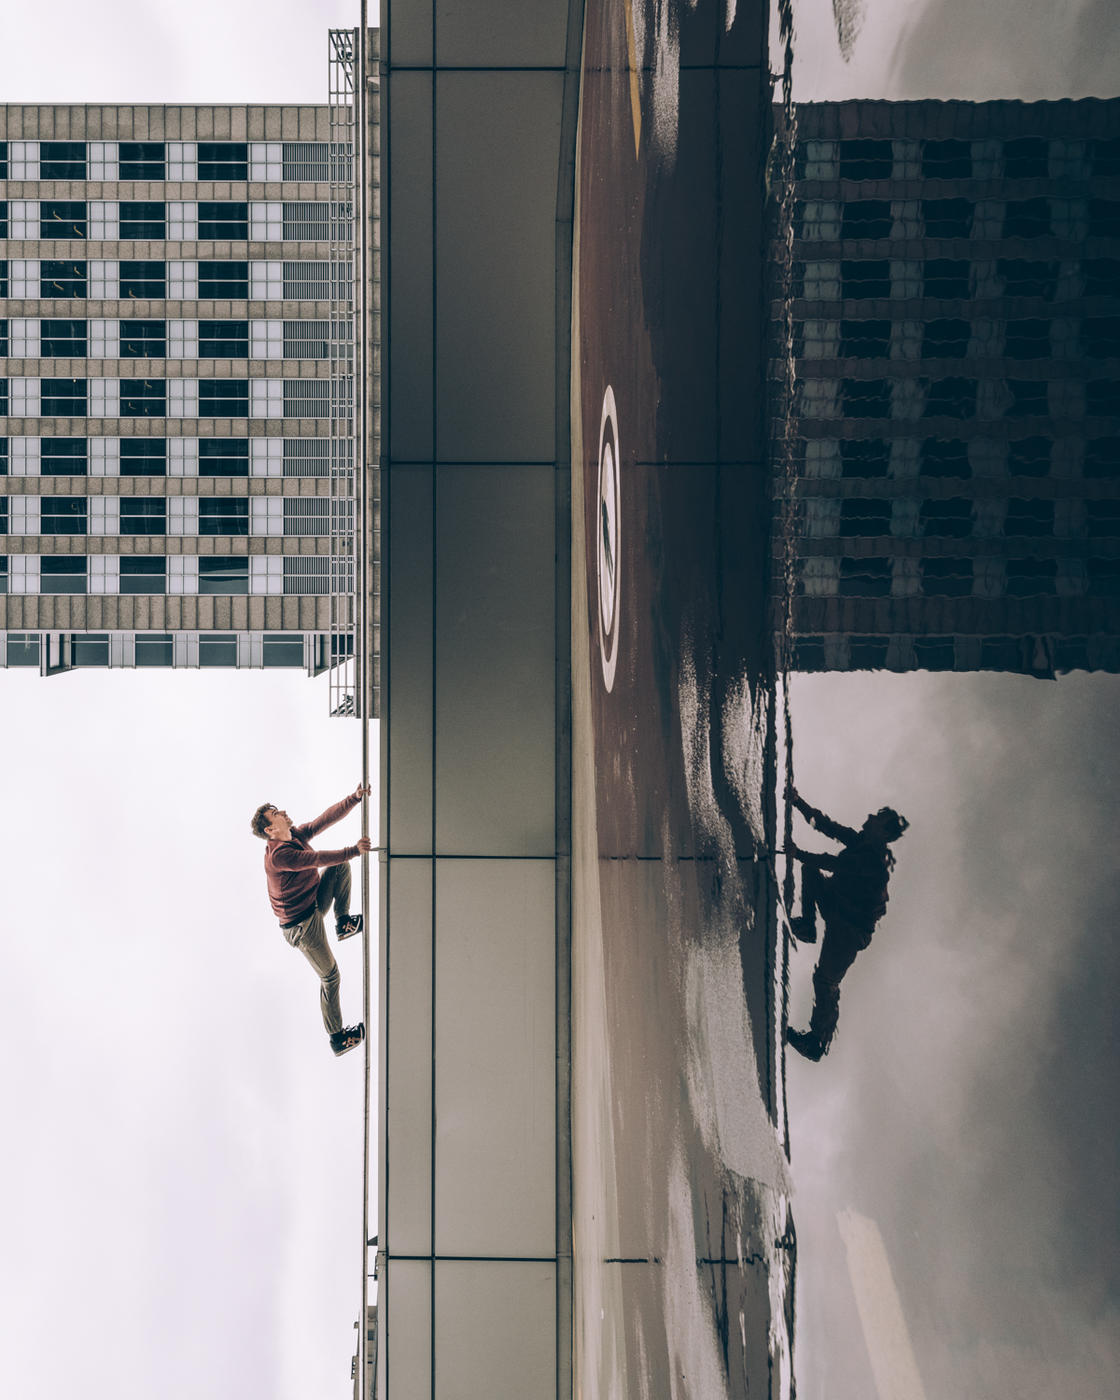 Photo, photographe, architecture, urbain, city, cityscape, paysages urbains, architecture urbaine, Nikon, Max Leitner, Pologne, Varsovie, gymnaste, acrobaties, perspectives, cadres, lignes, courbes, lévitation, renversant, illusion, illusionniste, trompe l'œil, Benni Grams